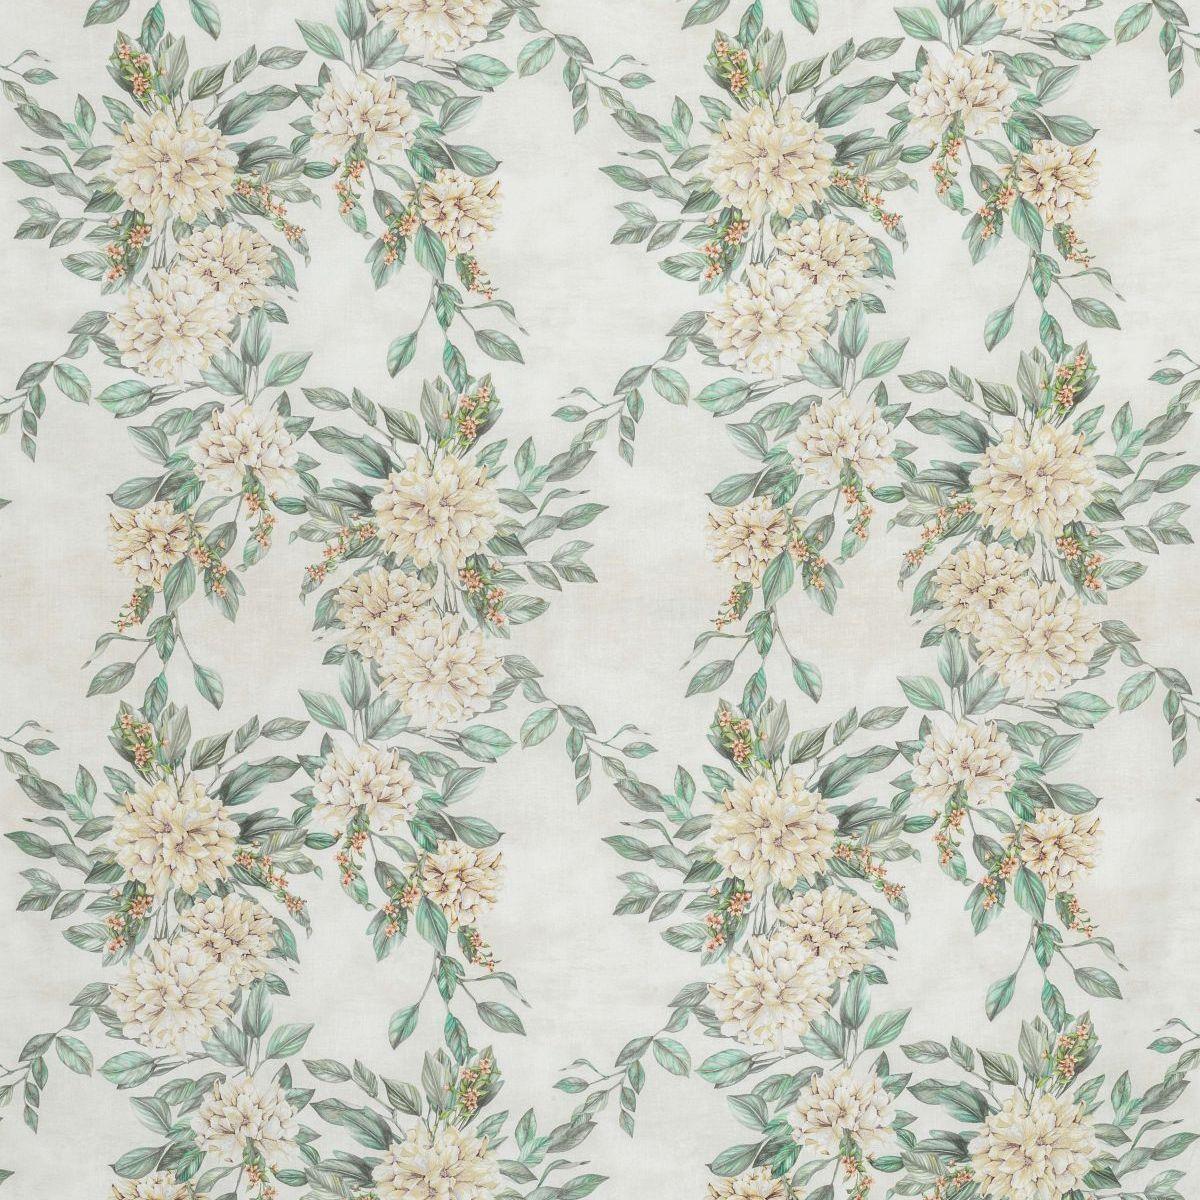 hochwertige tapeten und stoffe dekostoff enchanted gardens osborne little f7016 03 decowunder. Black Bedroom Furniture Sets. Home Design Ideas